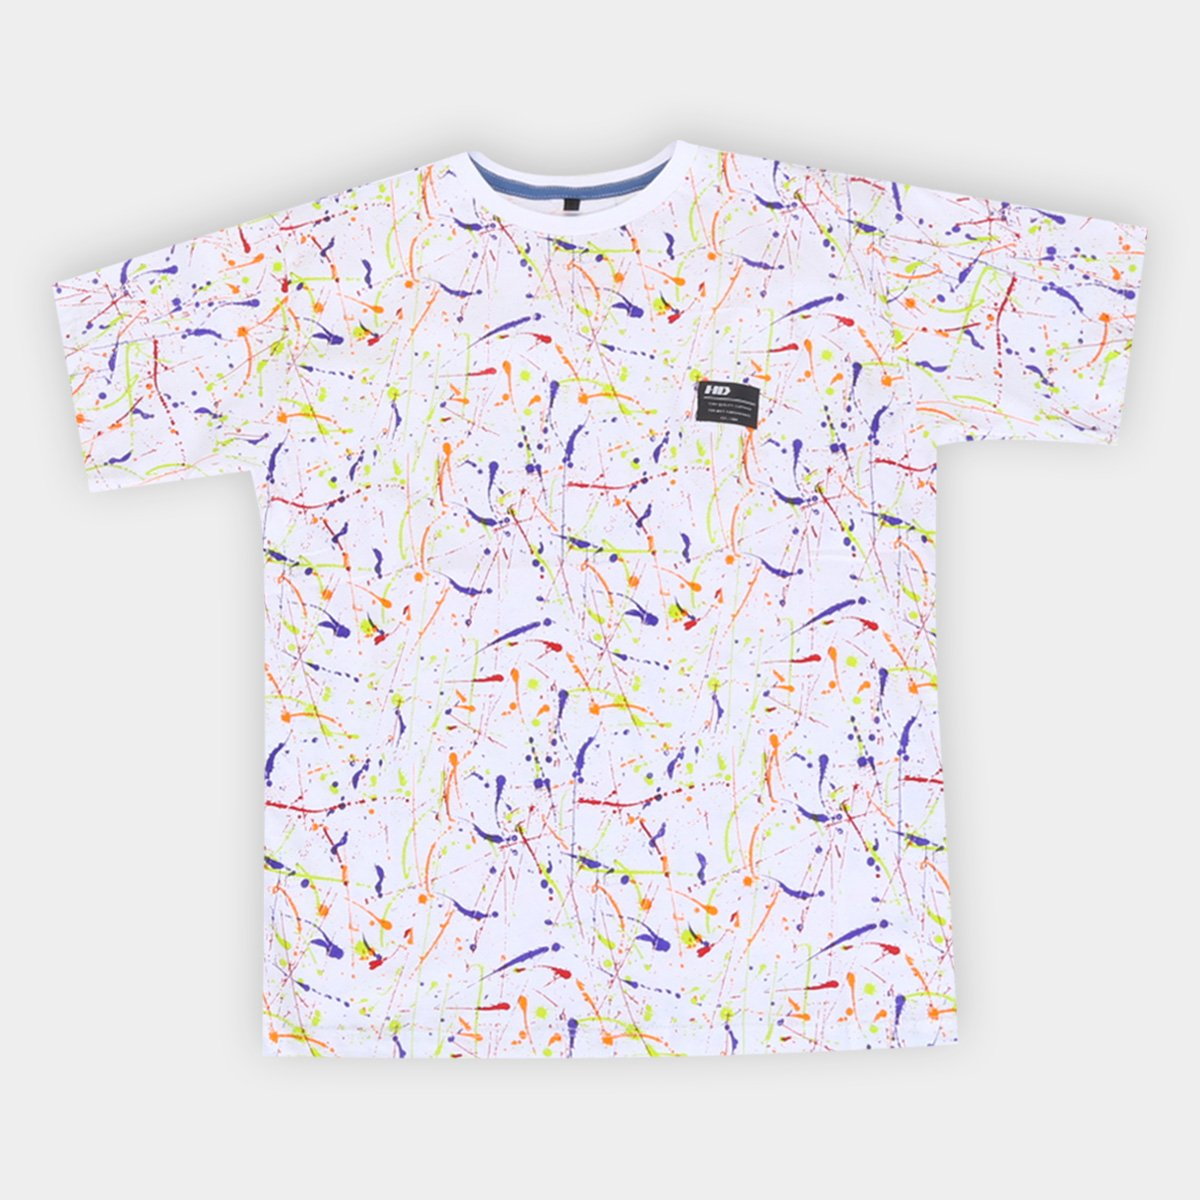 Camiseta Juvenil HD Estampada Masculina